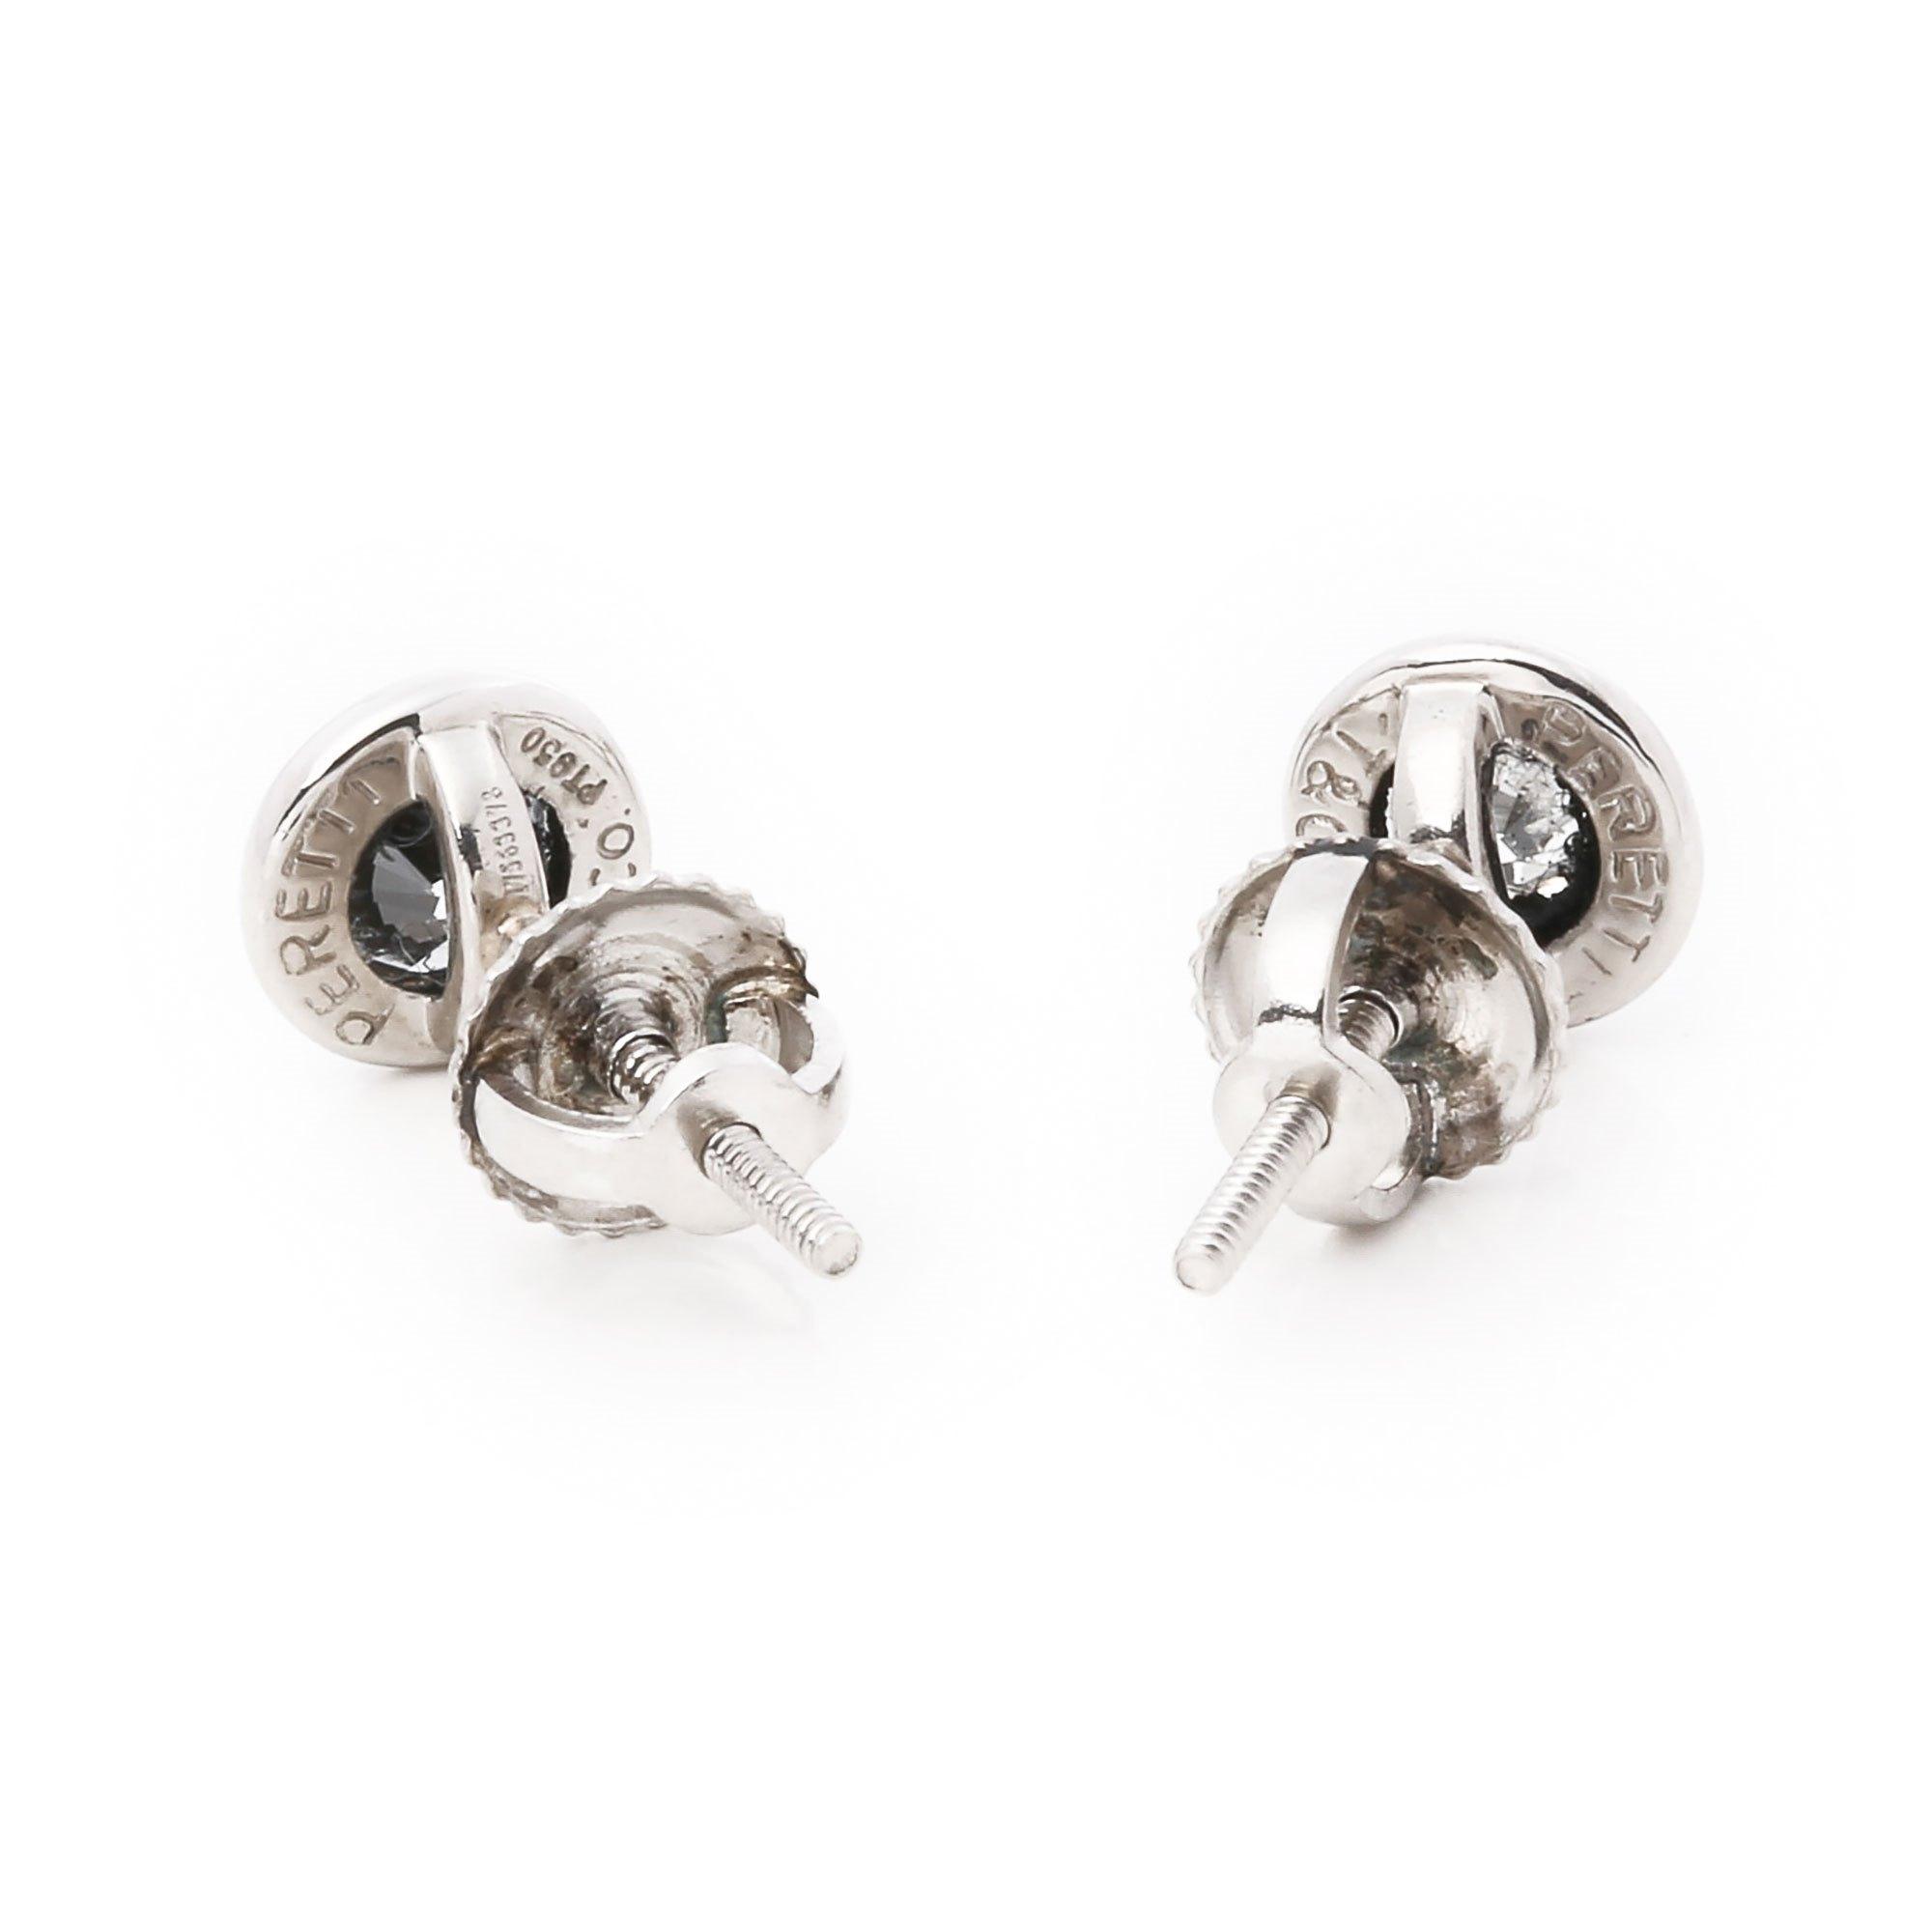 Tiffany & Co. Diamonds by the Yard 0.70ct Diamond Stud Earrings